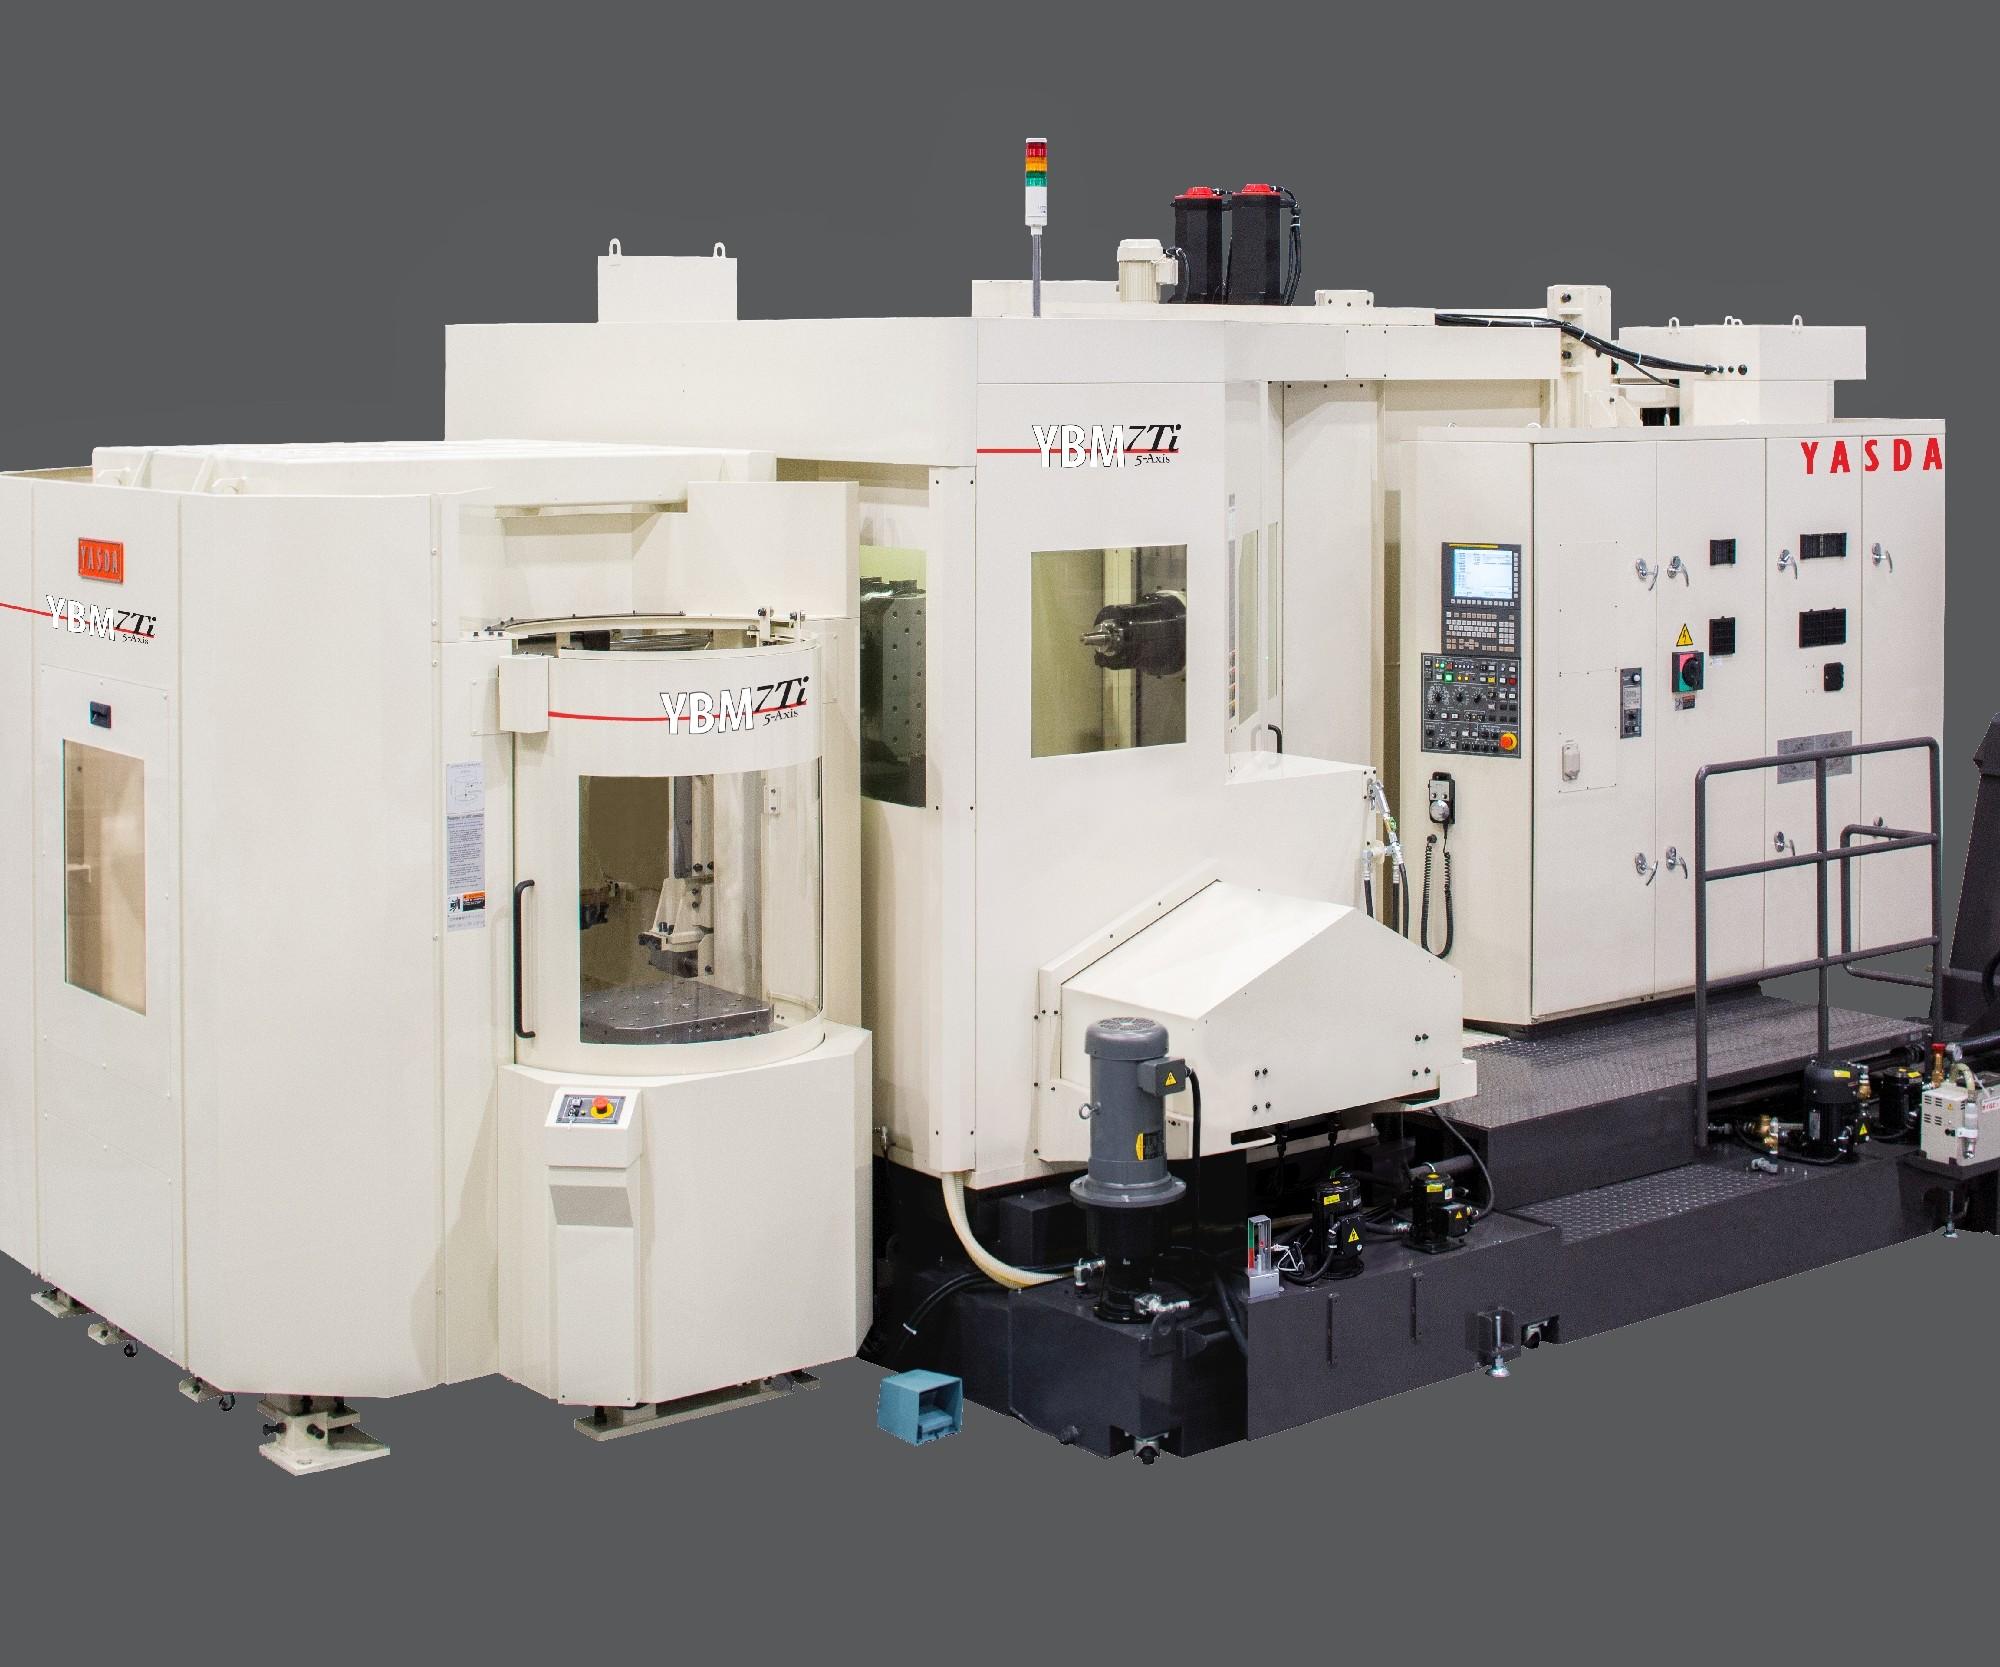 Methods Machine Tools will display Yasda's YBM 7Ti HMC at IMTS 2018.